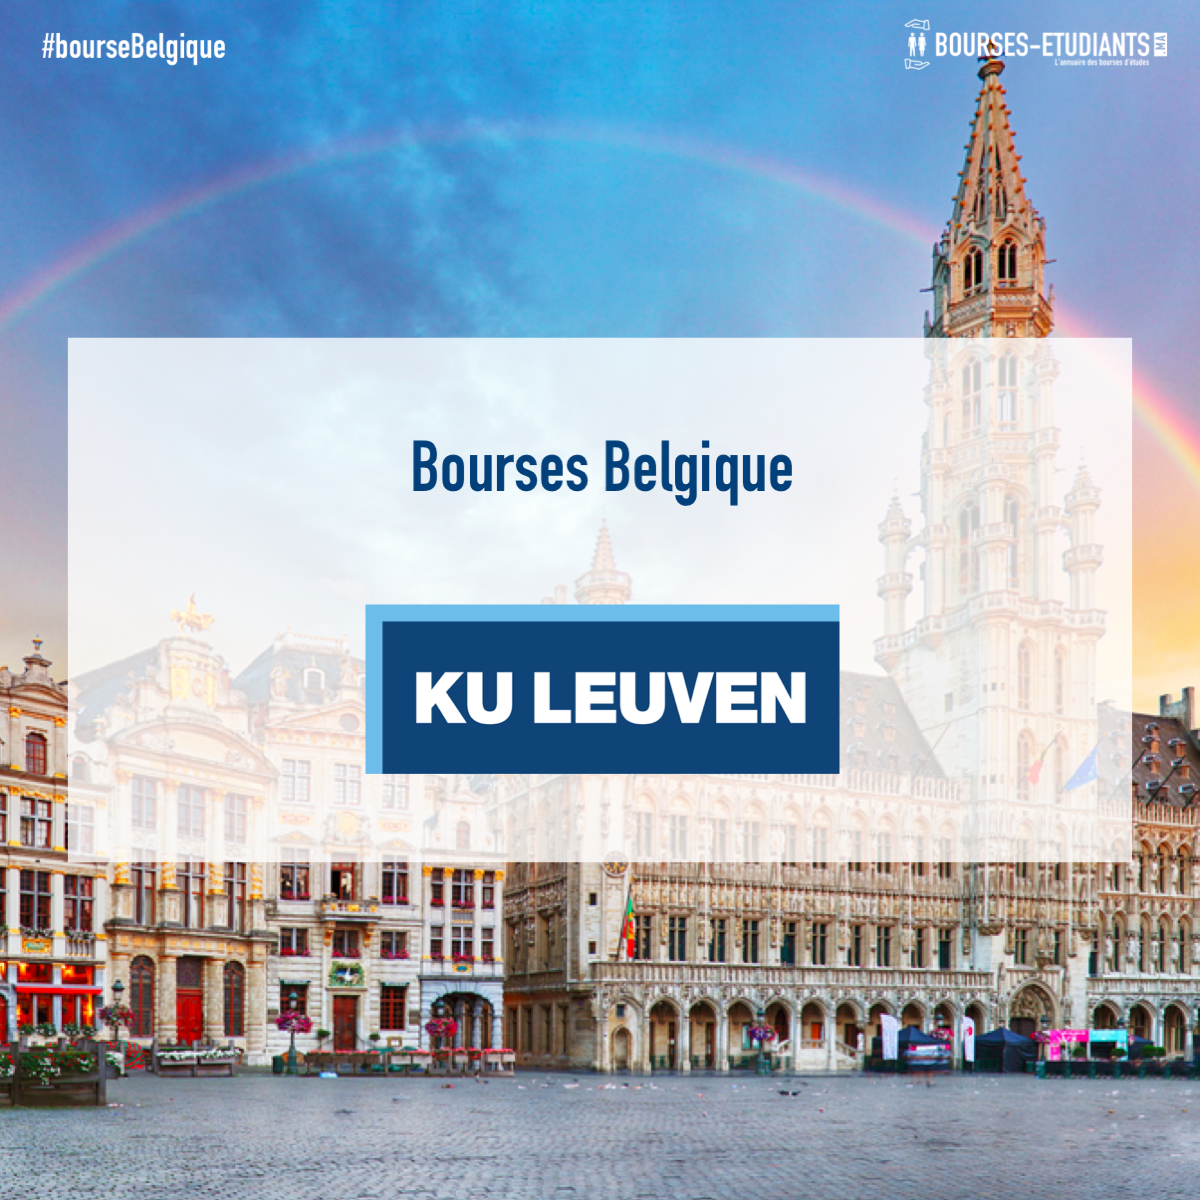 Ku Lueven University Scholarship